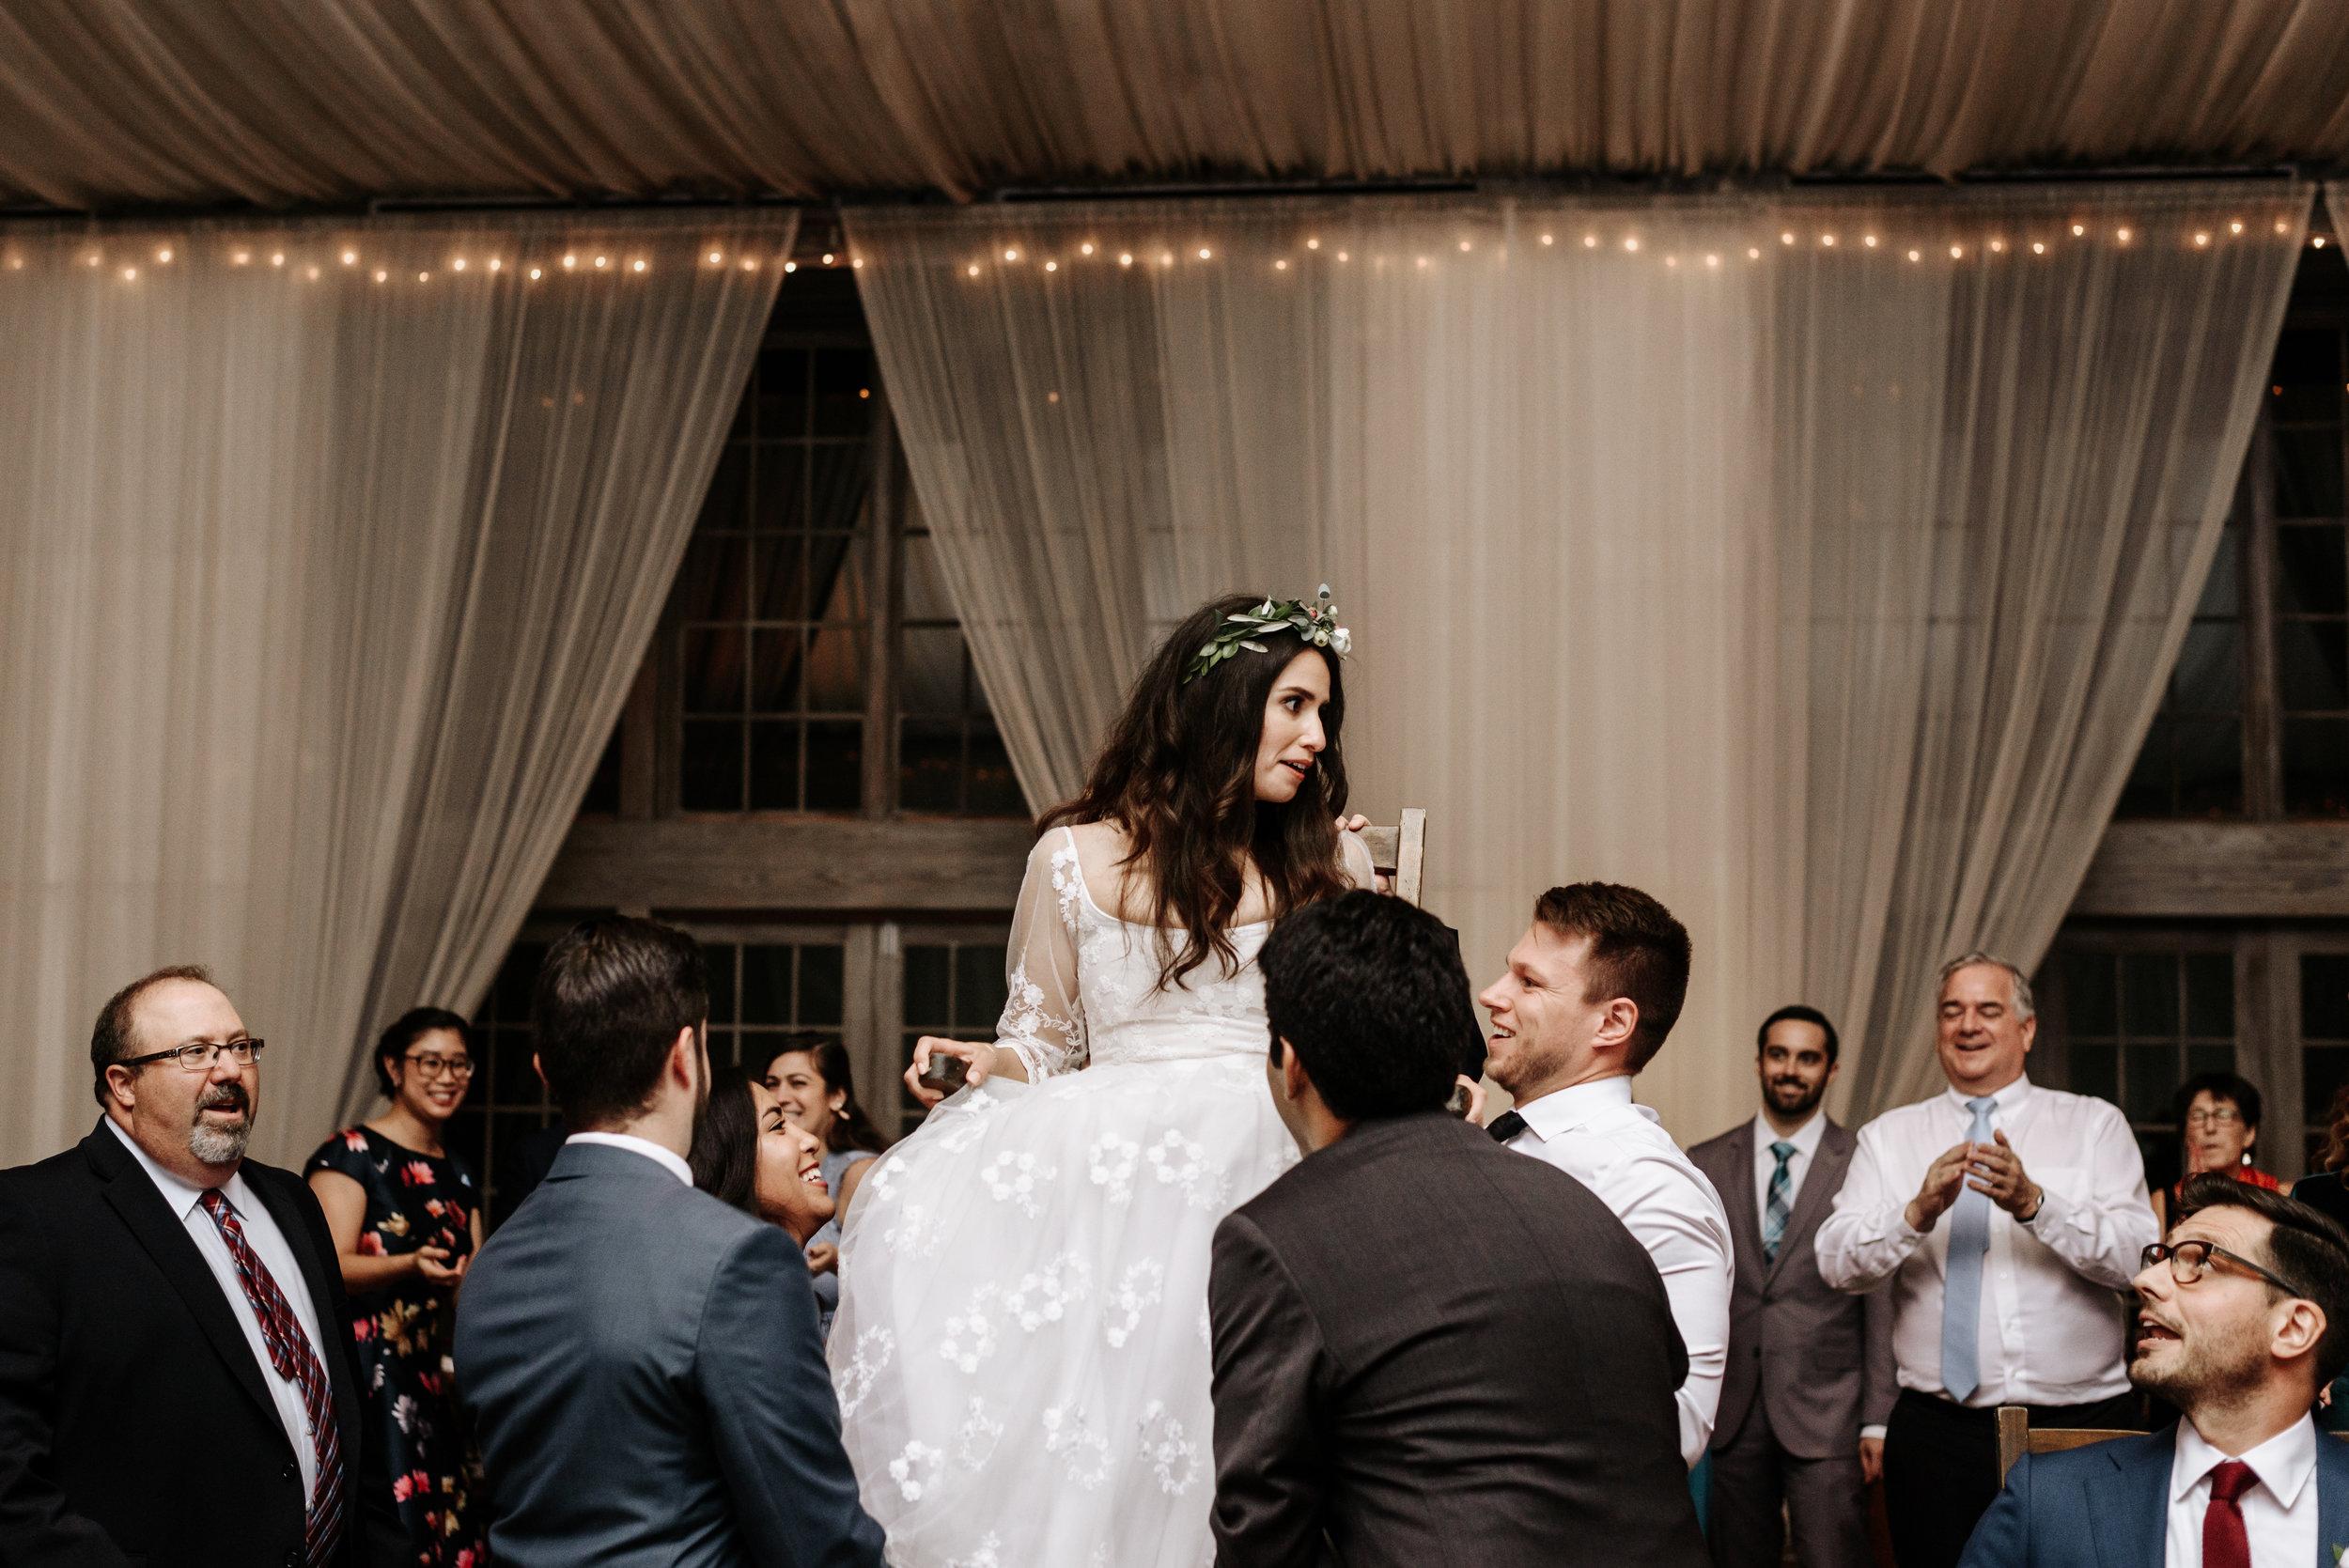 Veritas-Vineyards-and-Winery-Wedding-Photography-Afton-Virginia-Yasmin-Seth-Photography-by-V-3265.jpg